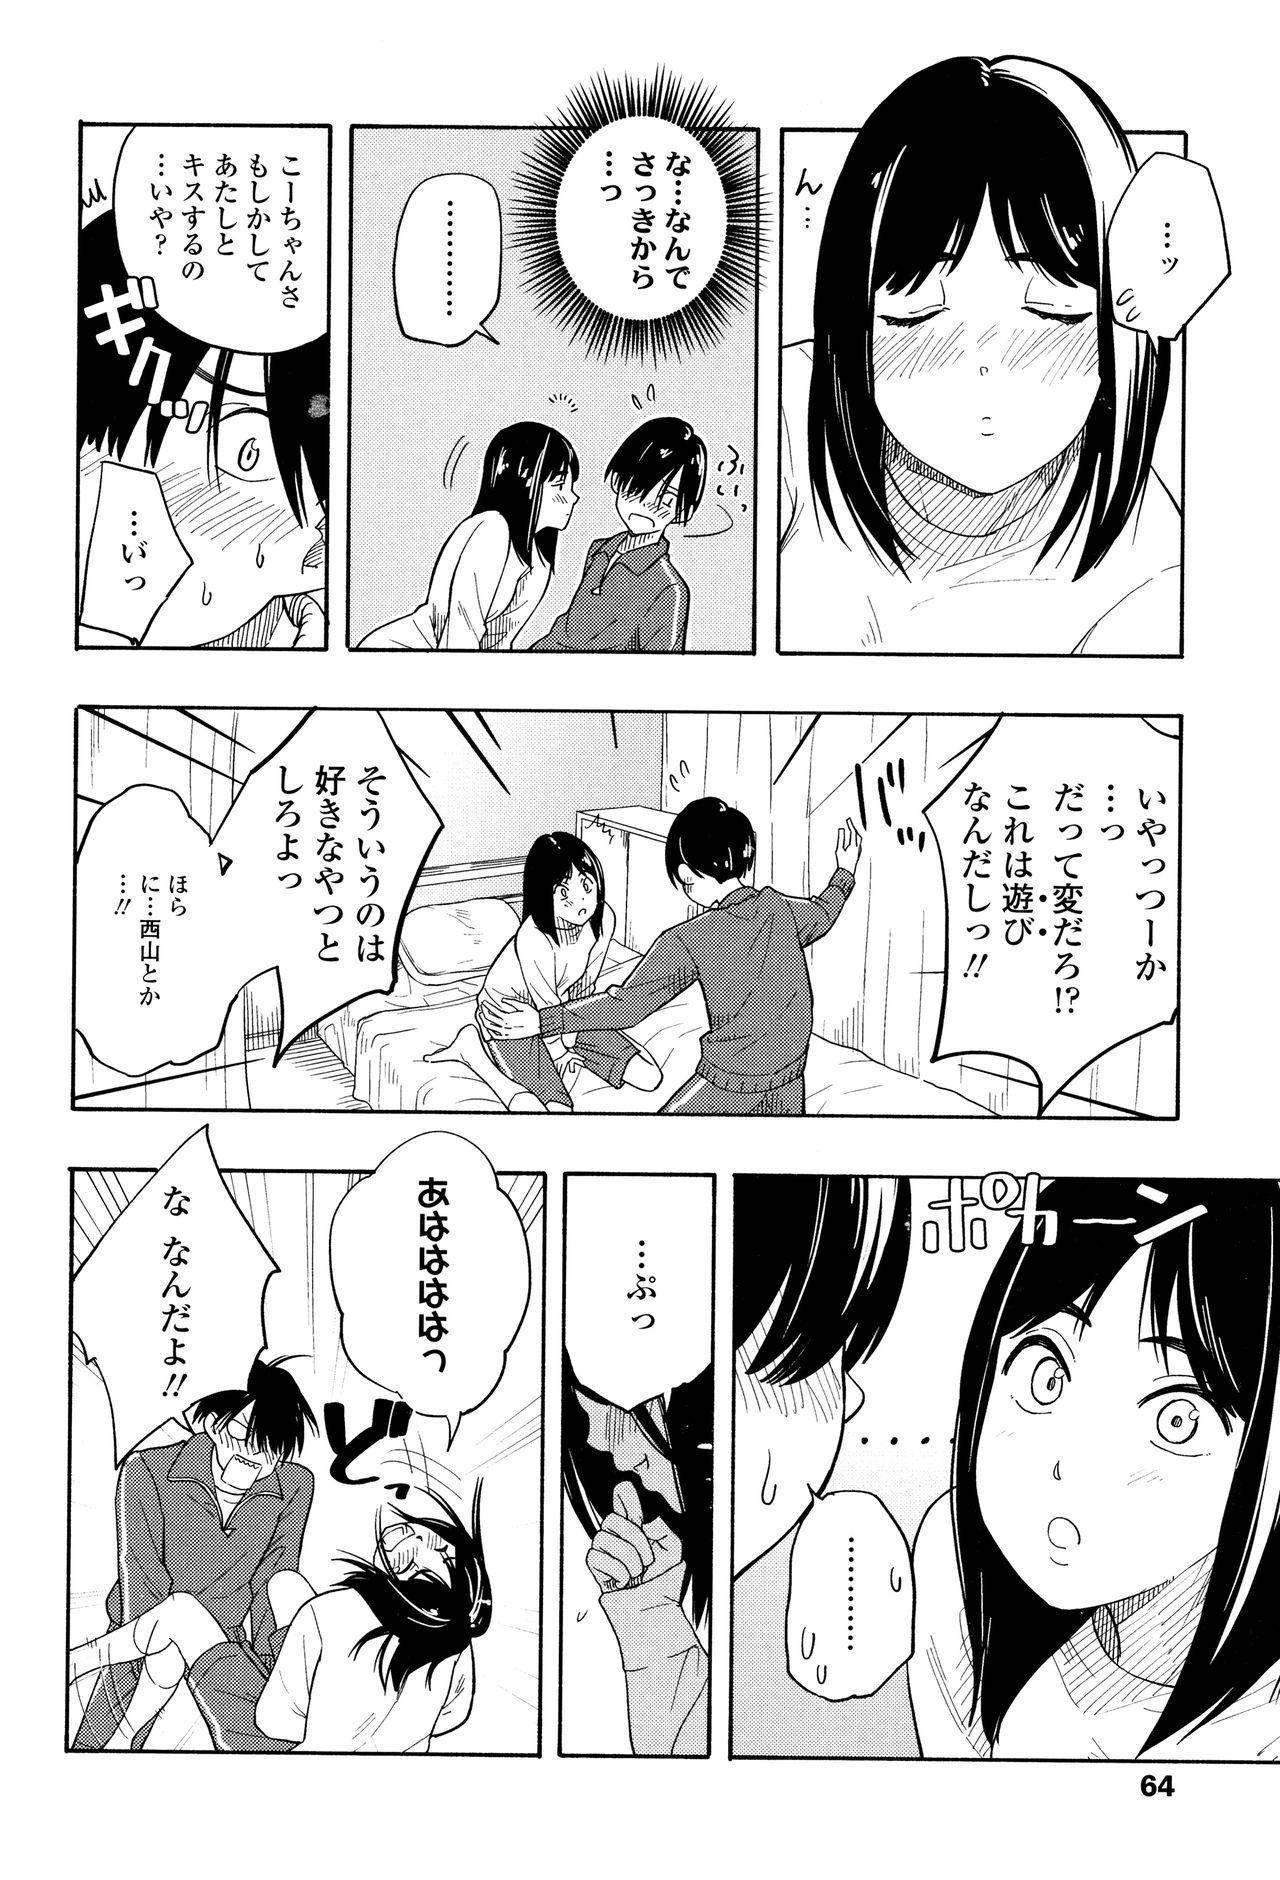 Shishunki no Eros - puberty eros 66